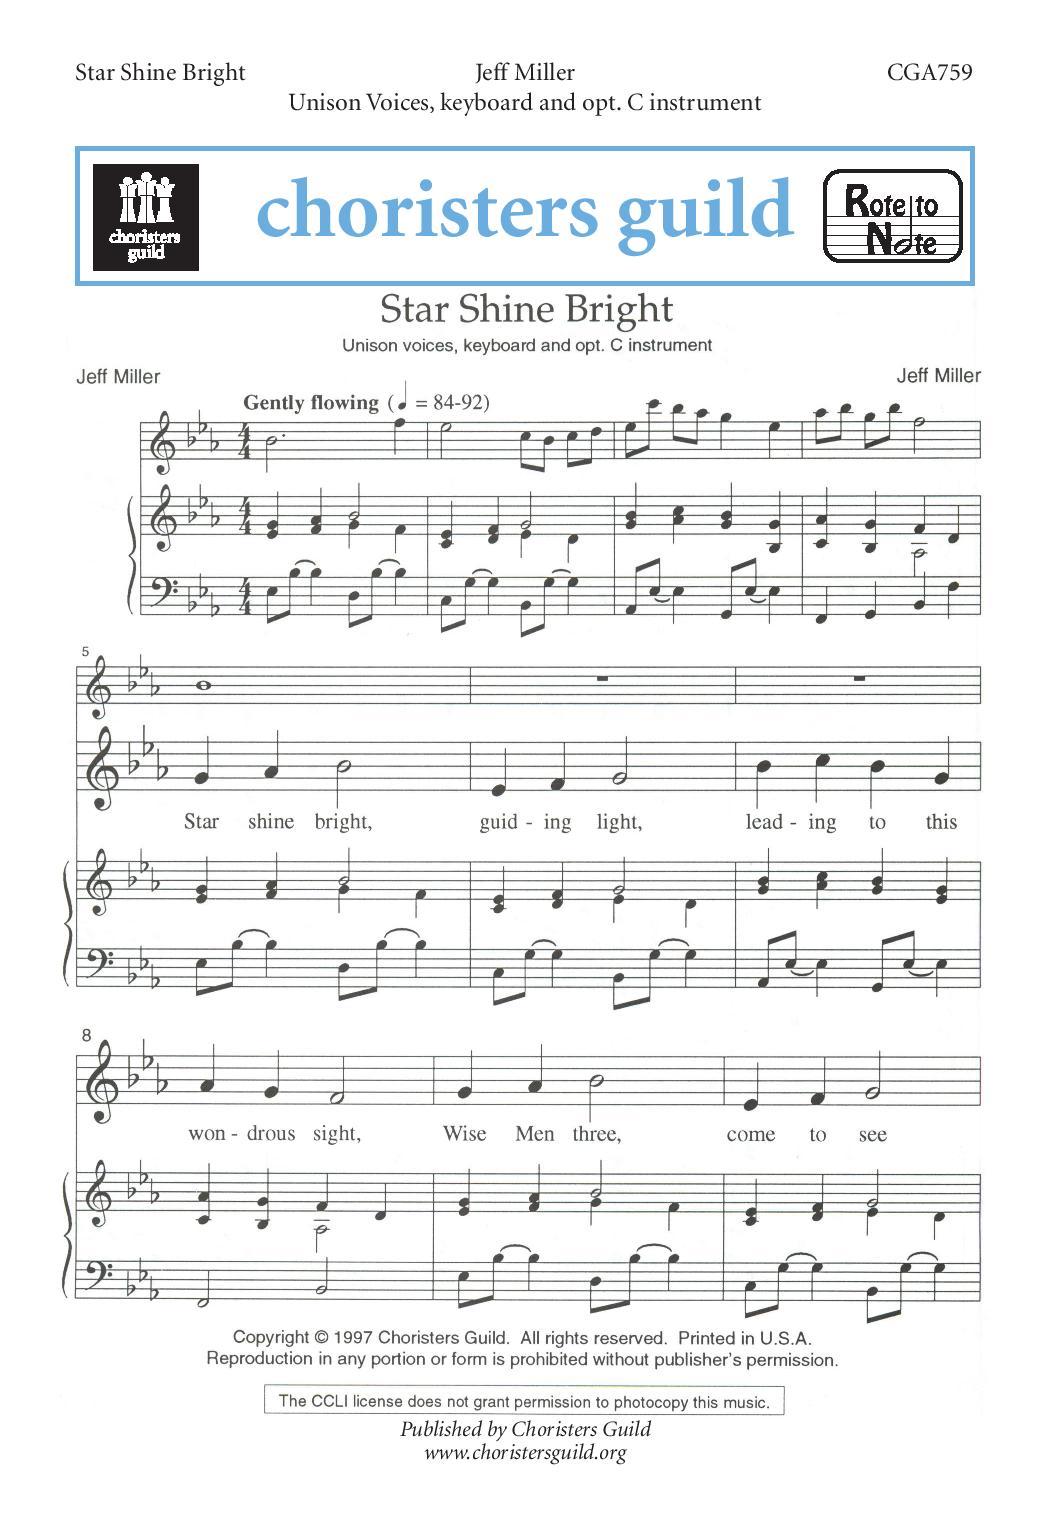 Star Shine Bright